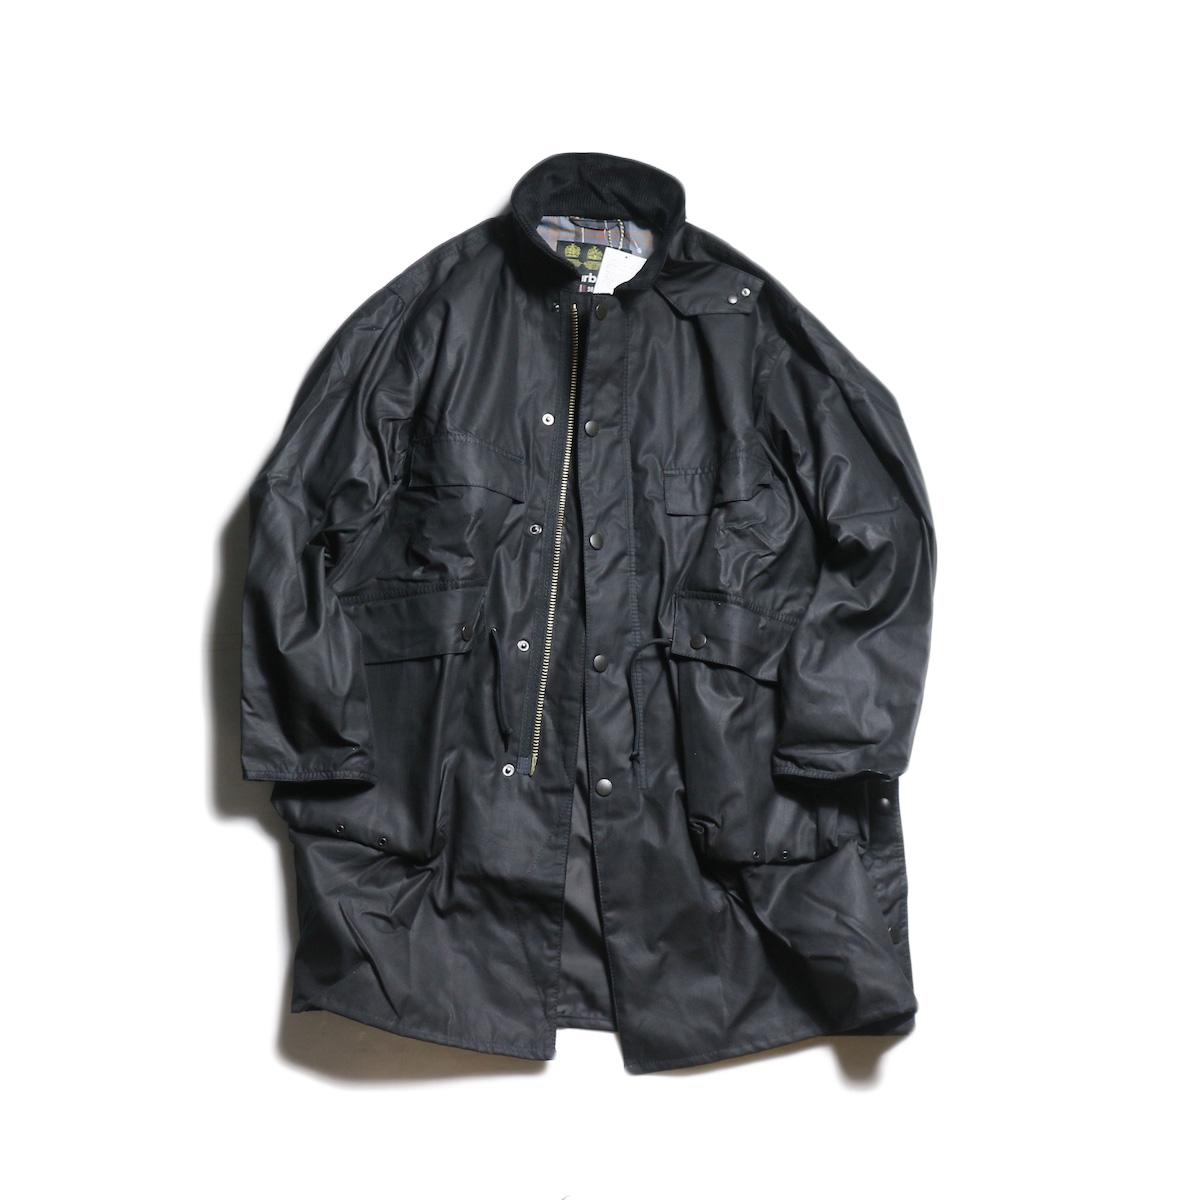 Kaptain Sunshine × Barbour / Stand Collar Traveller Coat (Black)